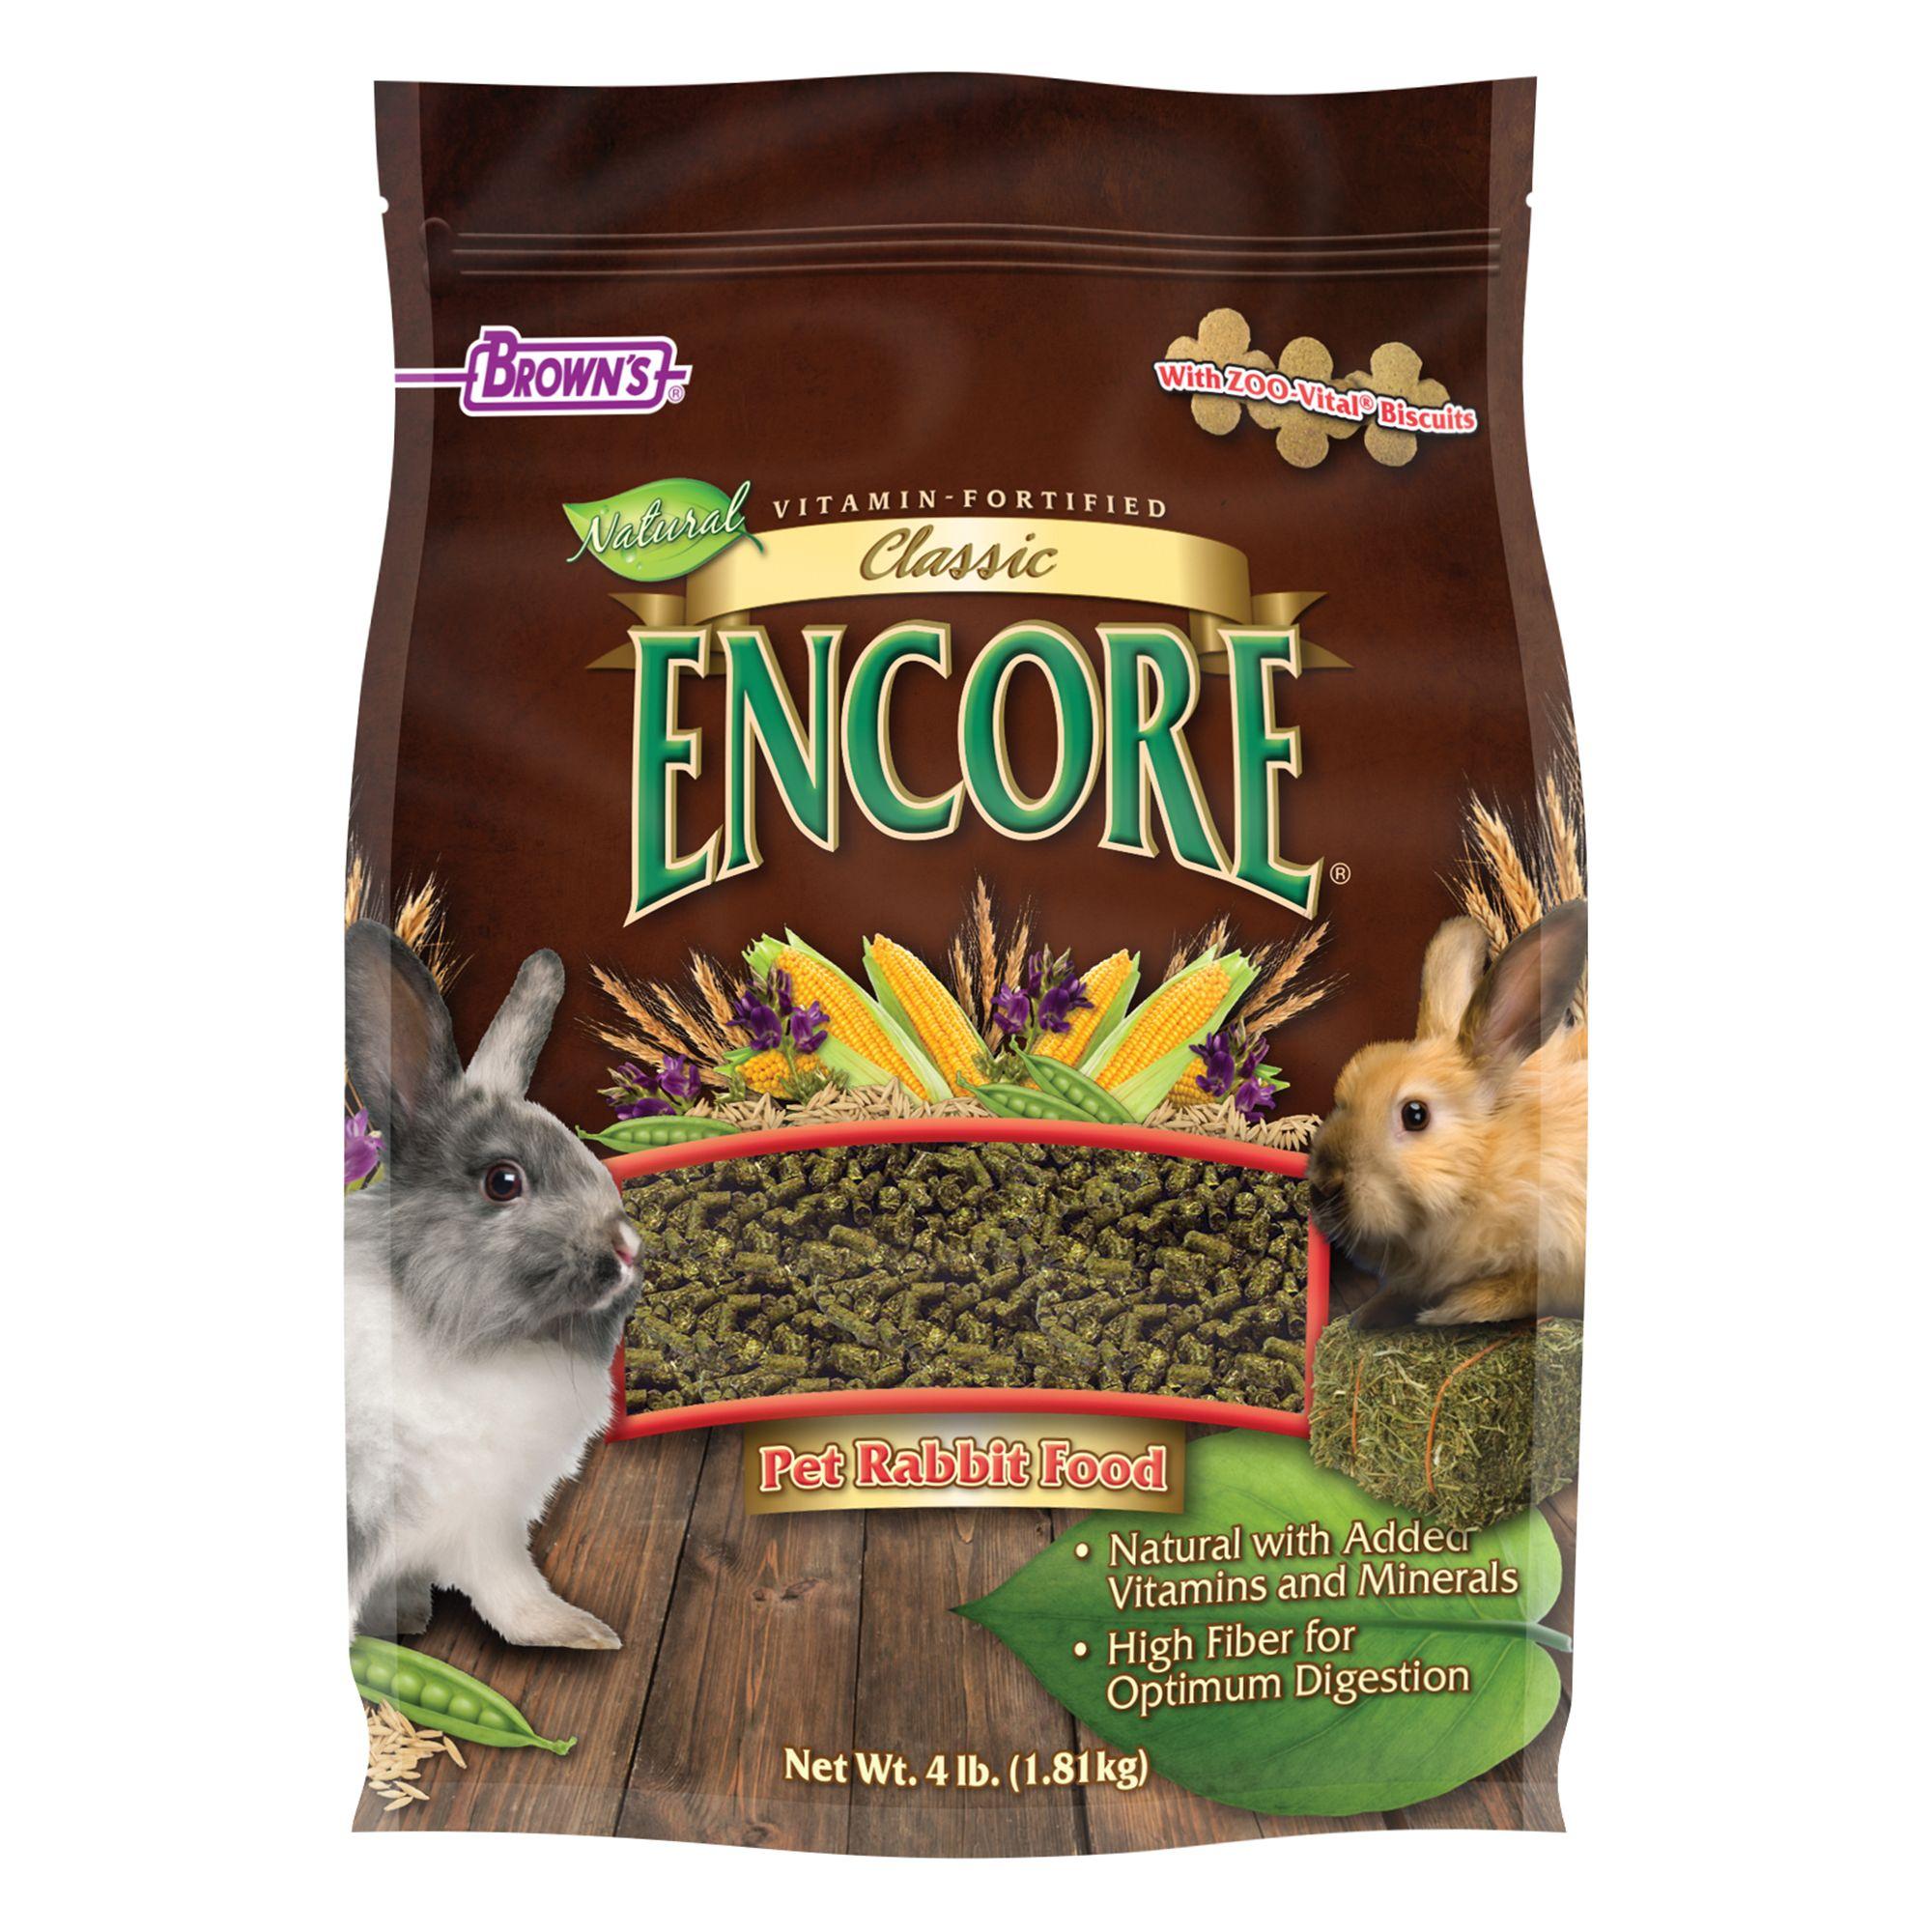 Browns Encore Classic Natural Rabbit Food Size 4 Lb Fm Browns